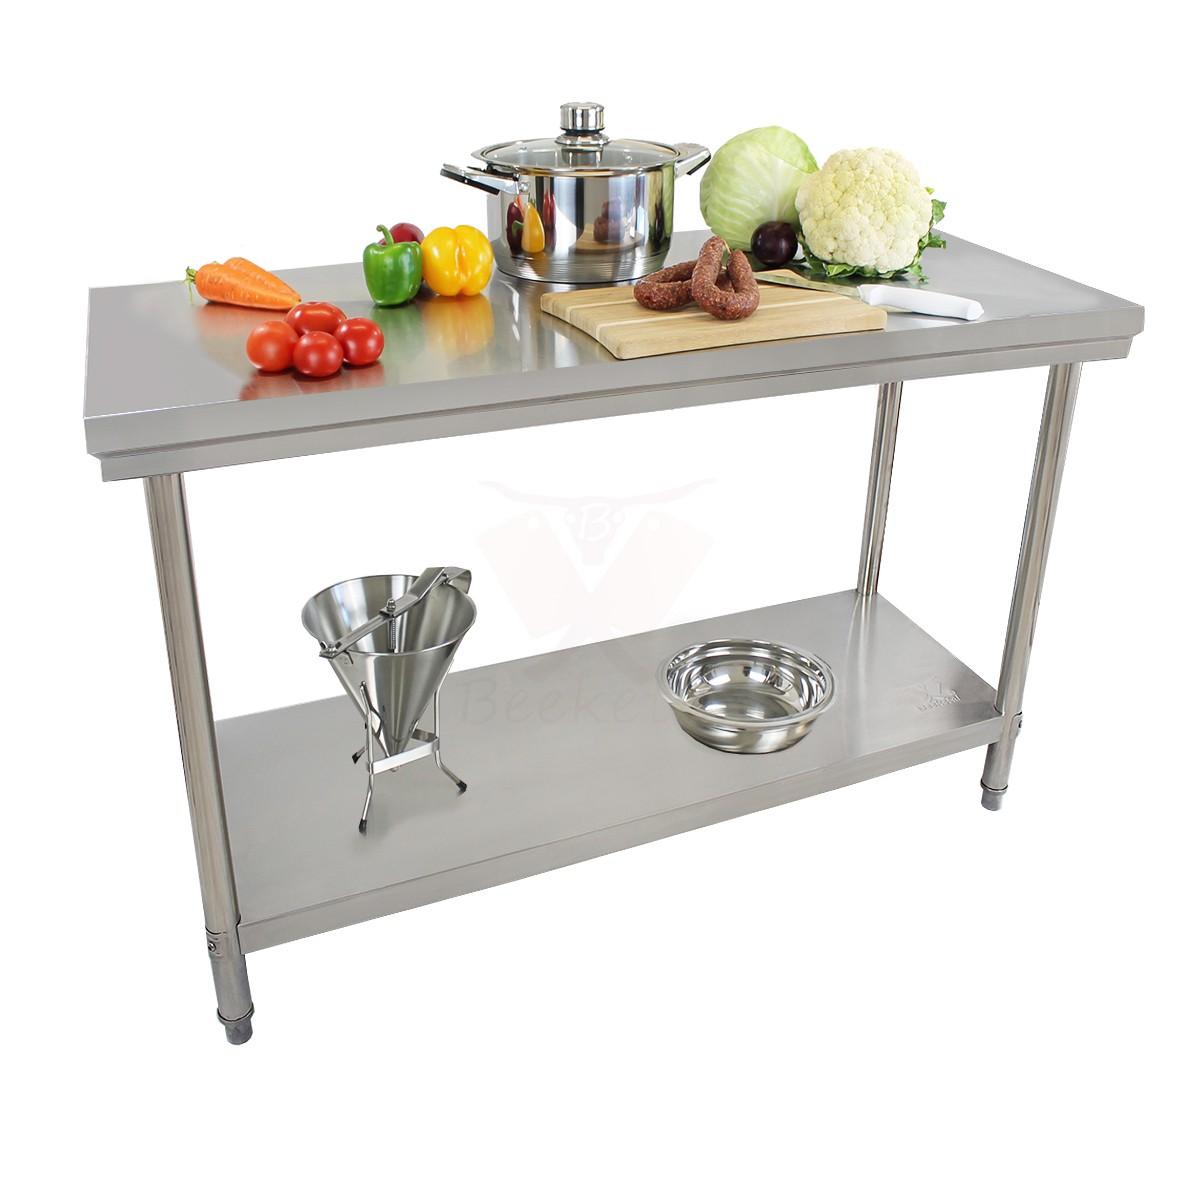 Beeketal Gastro Tisch Zerlegetisch Edelstahltisch Arbeitstisch